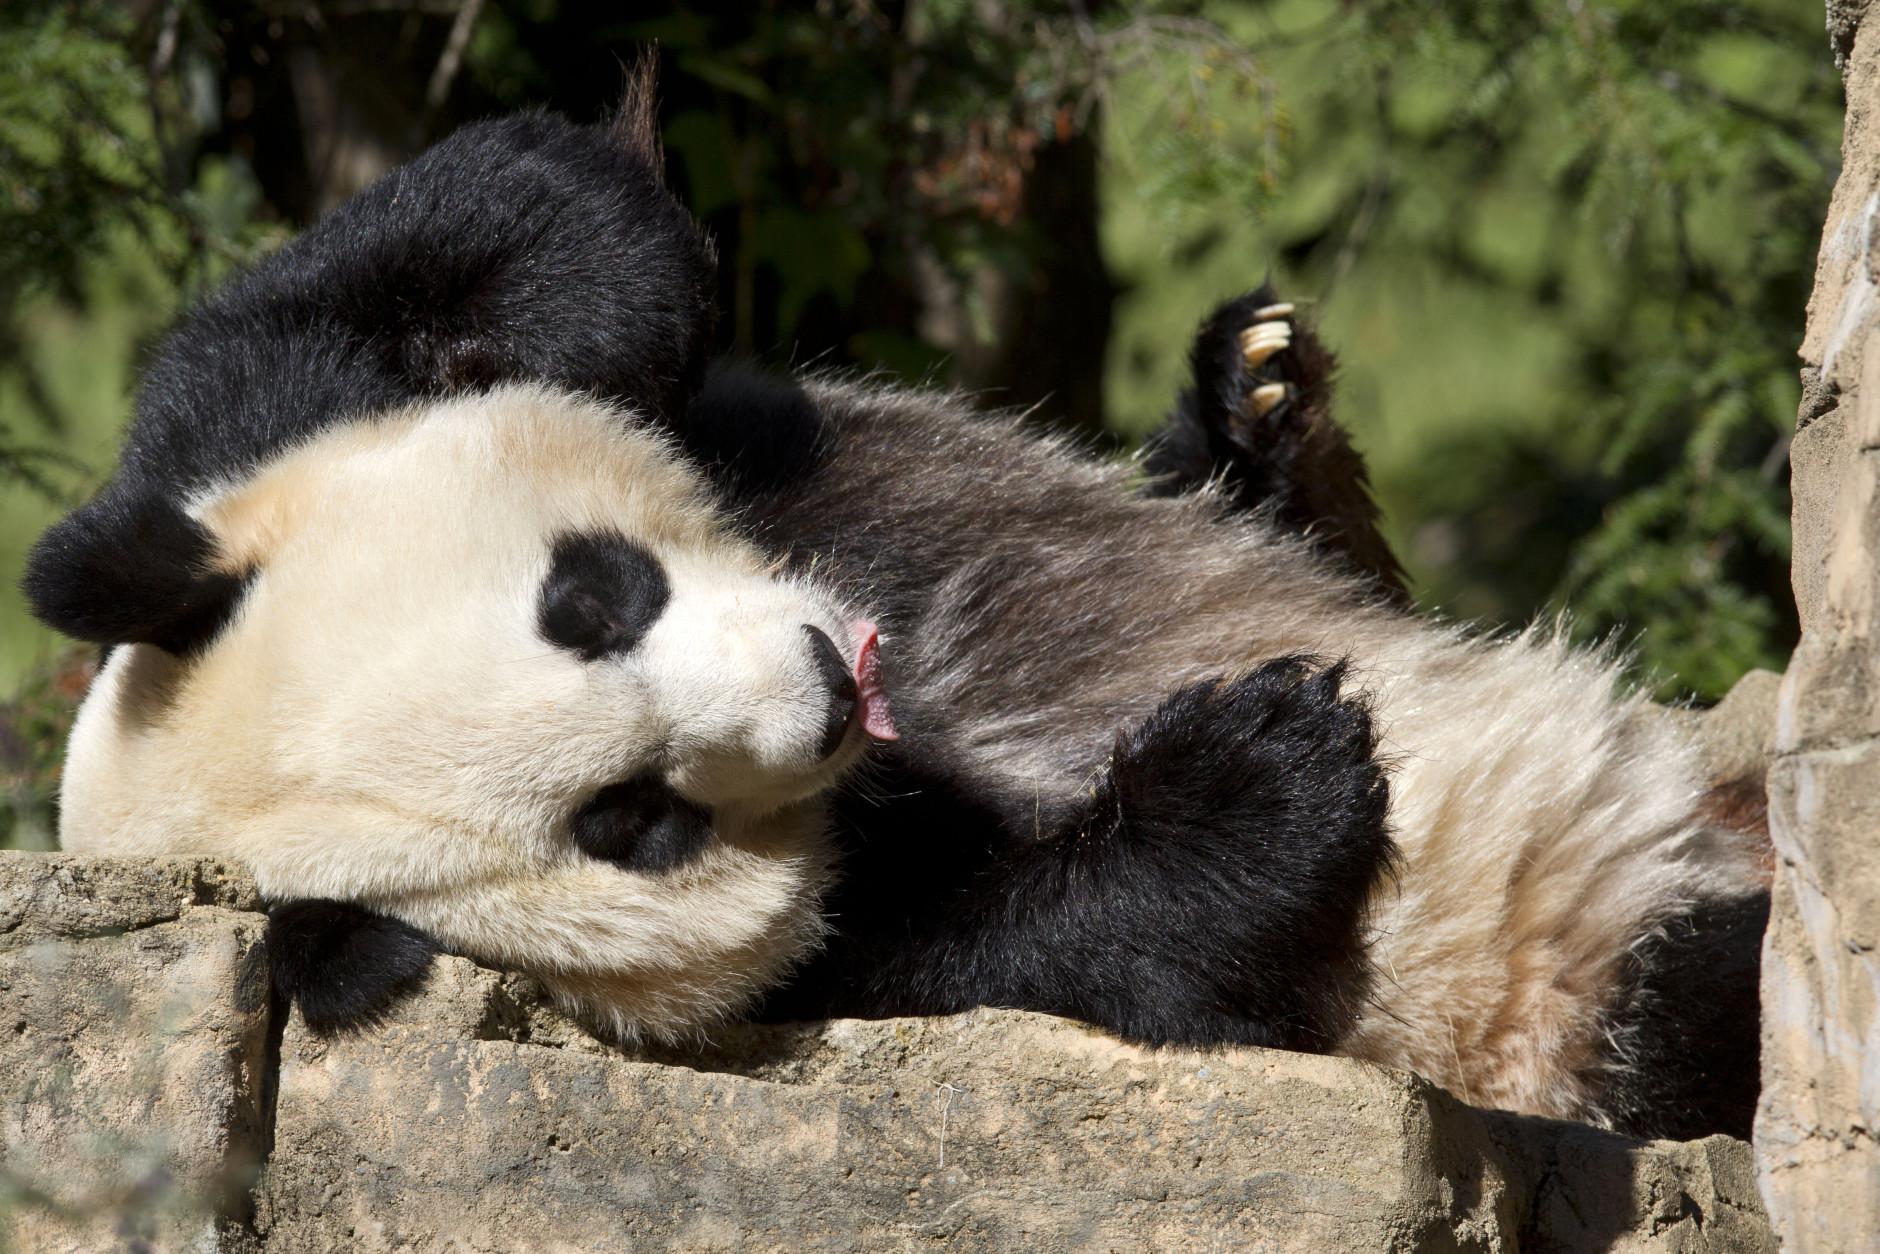 Pregnant panda? National Zoo detects possible fetus